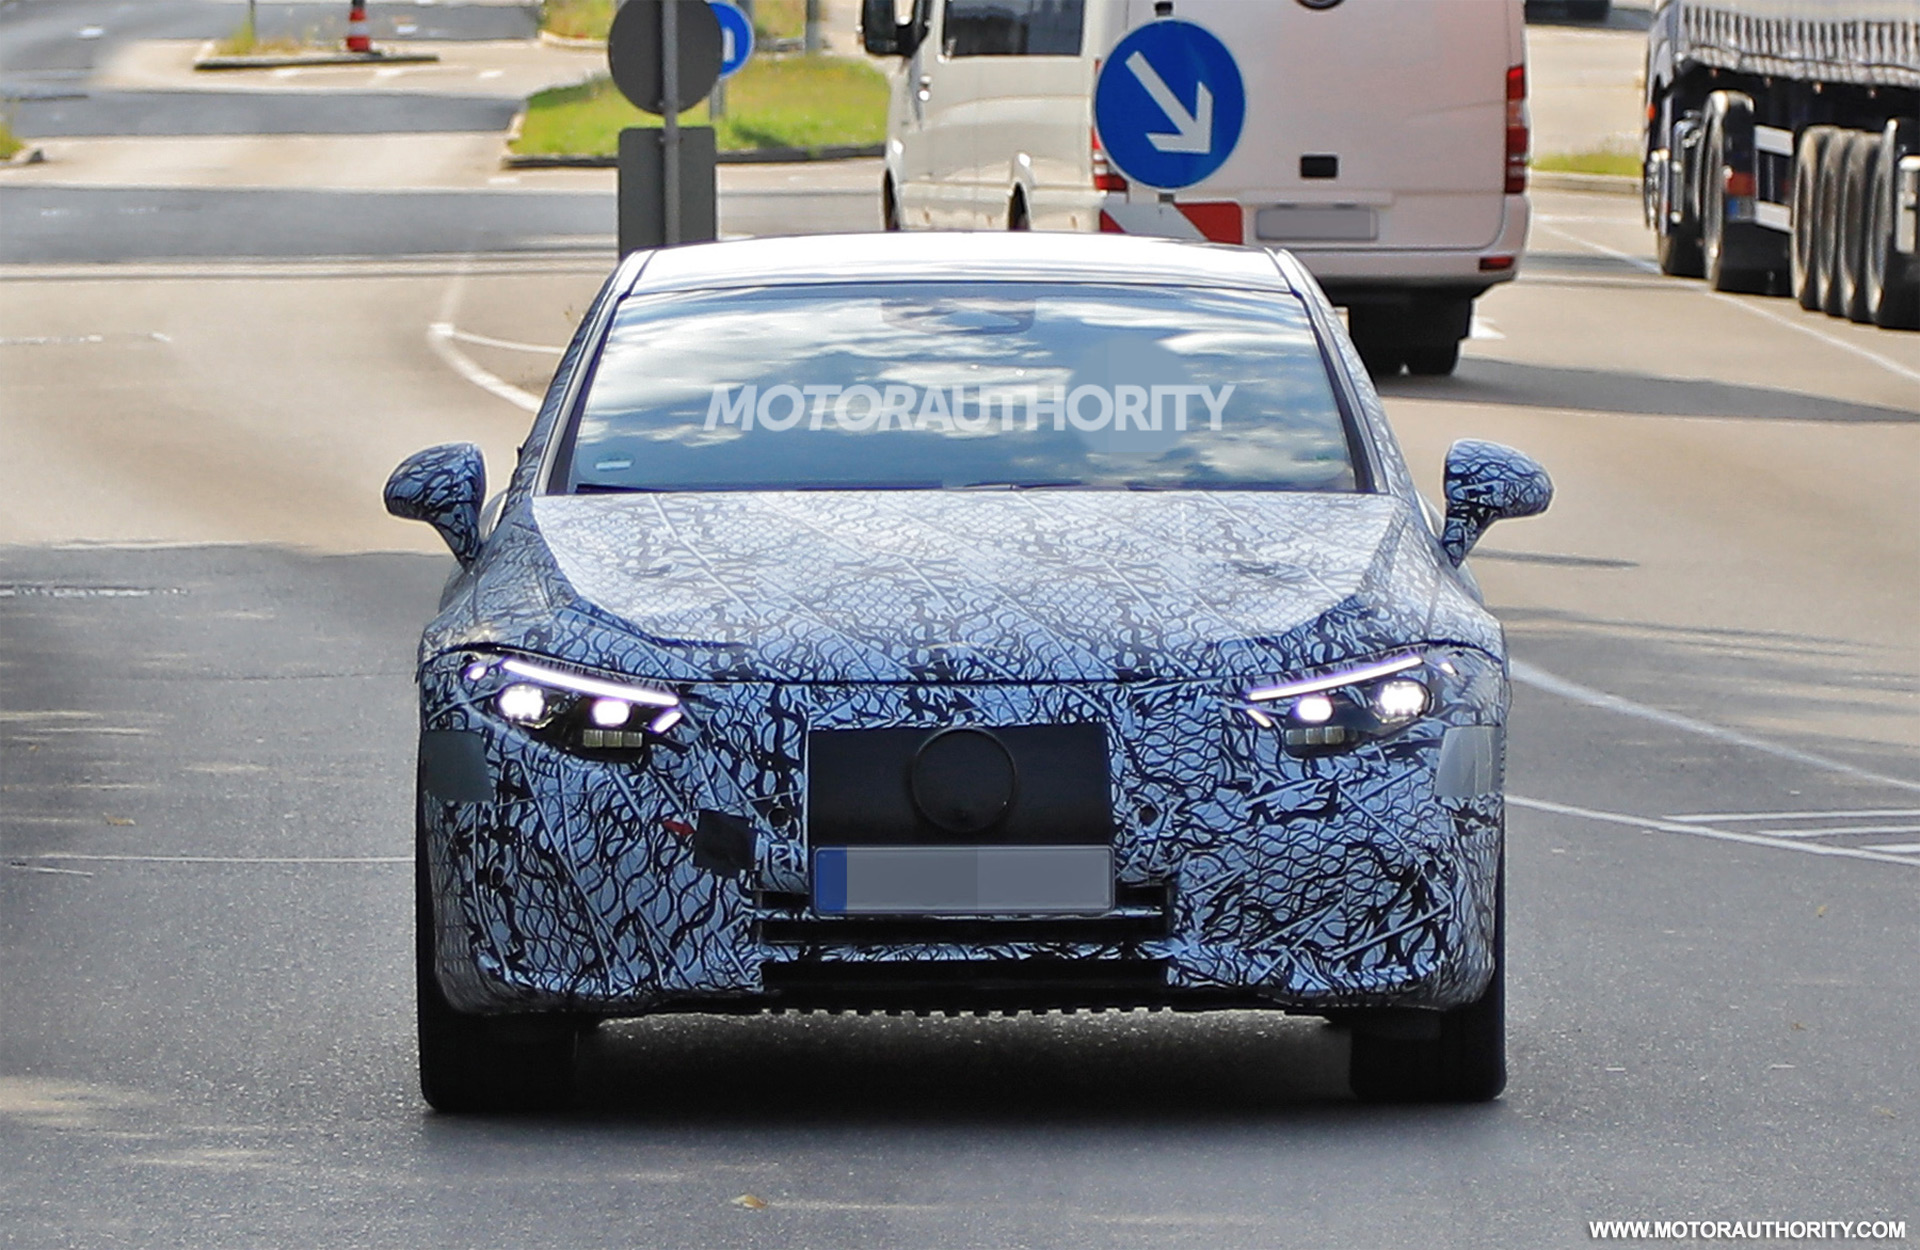 2020 - [Mercedes-Benz] EQ S - Page 4 2021-mercedes-benz-eqs-spy-shots--photo-credits-baldauf-sb-medien_100753400_h